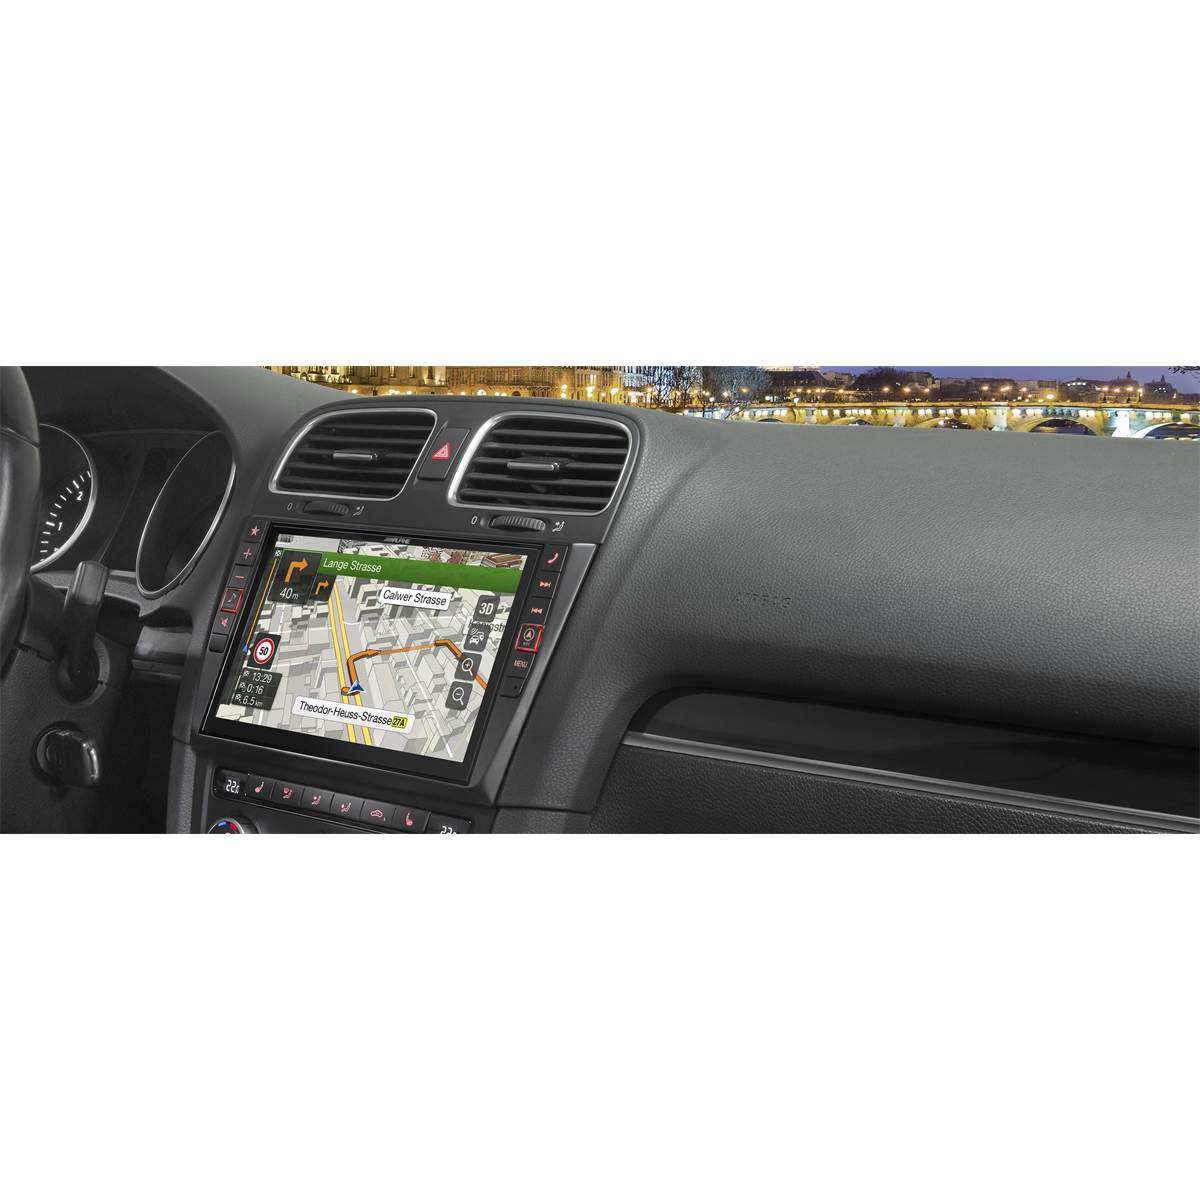 Autoradio GPS Alpine X901D-G6 pour Golf 6